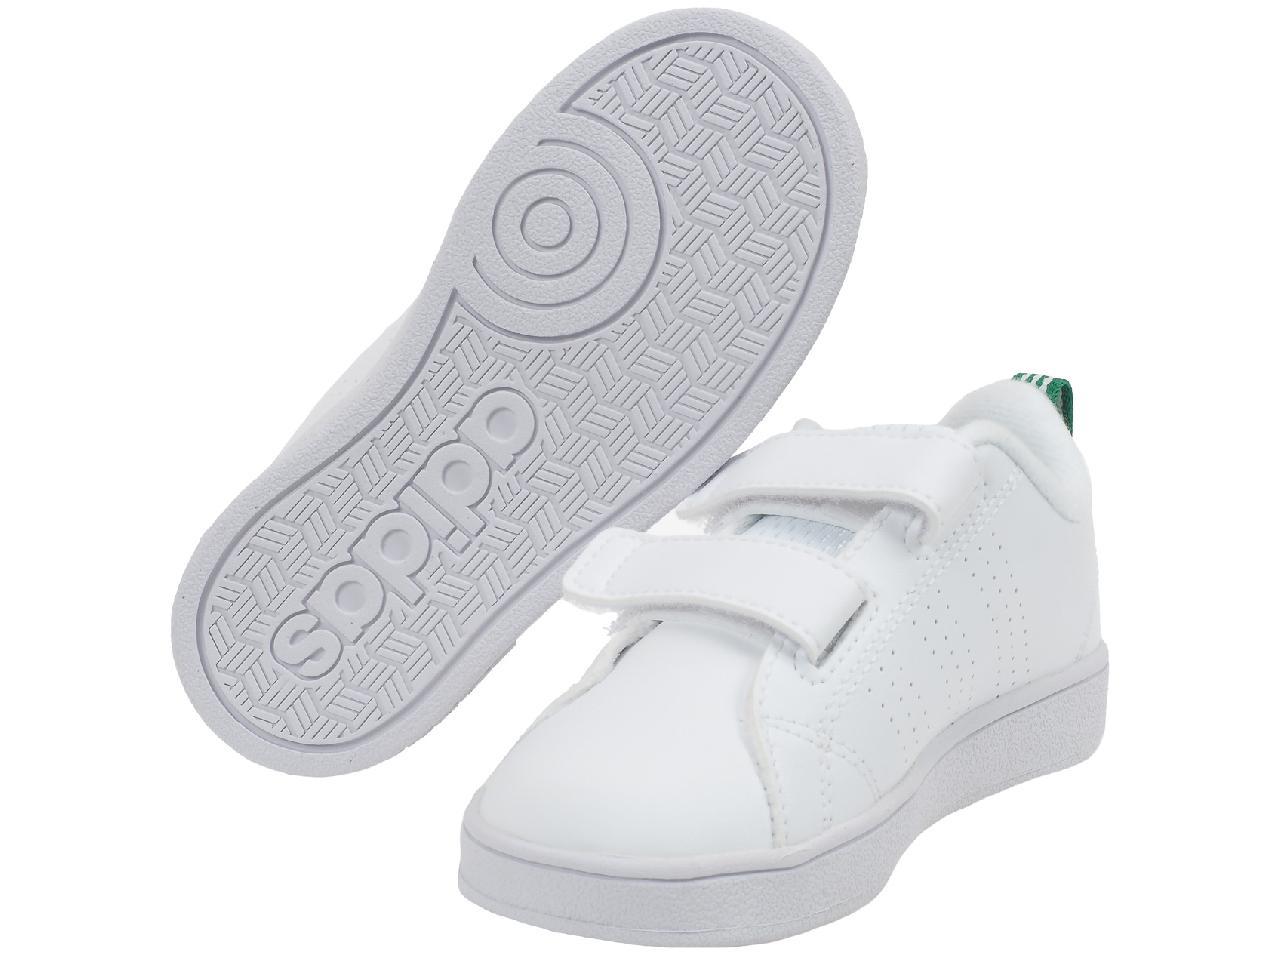 Chaussures-scratch-Adidas-neo-Advantage-baby-blc-vr-Blanc-33117-Neuf